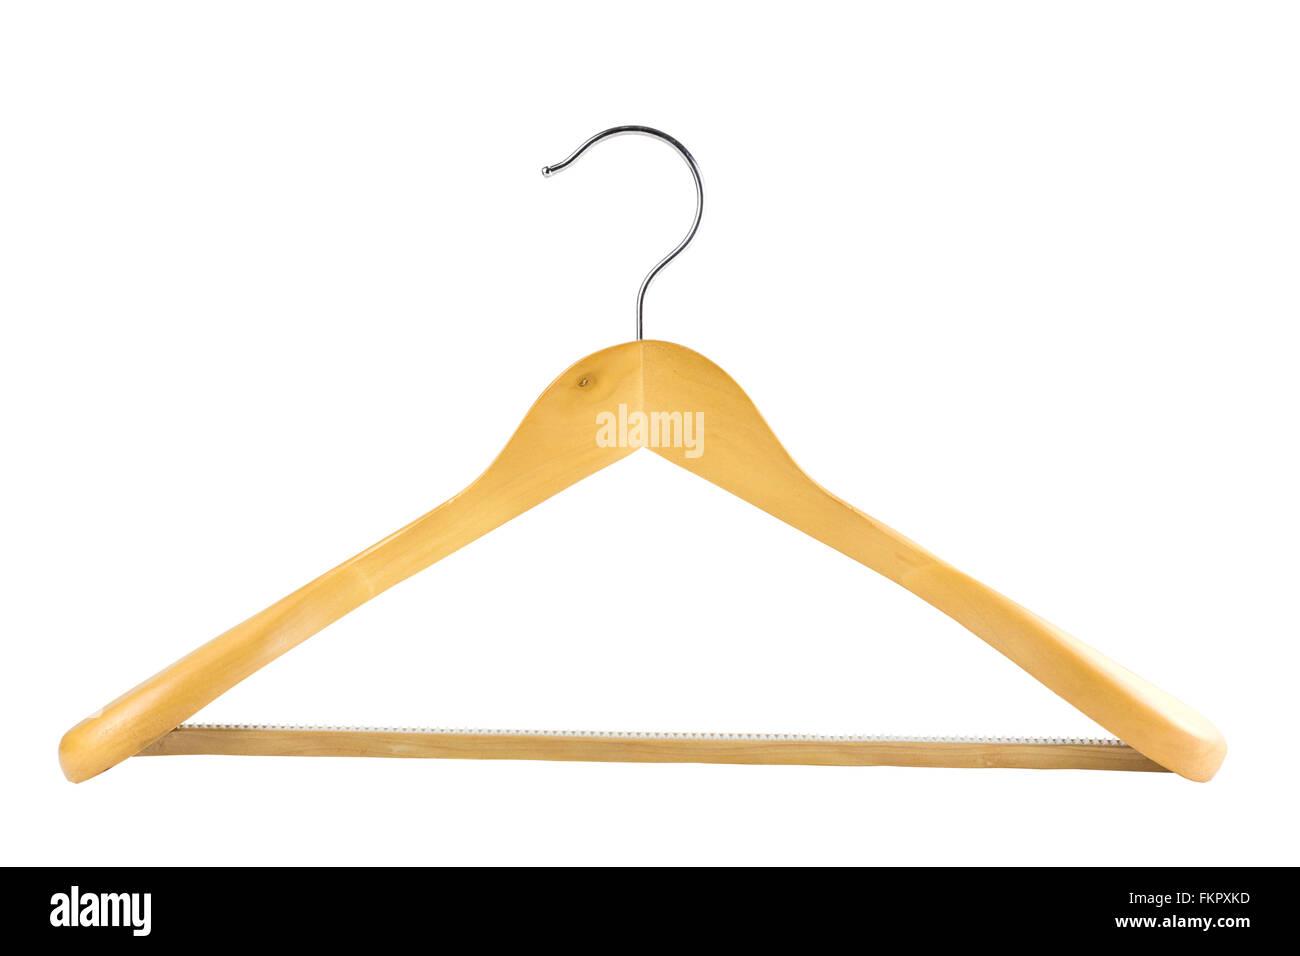 Percha de madera aislado sobre fondo blanco con trazado de recorte Foto de stock